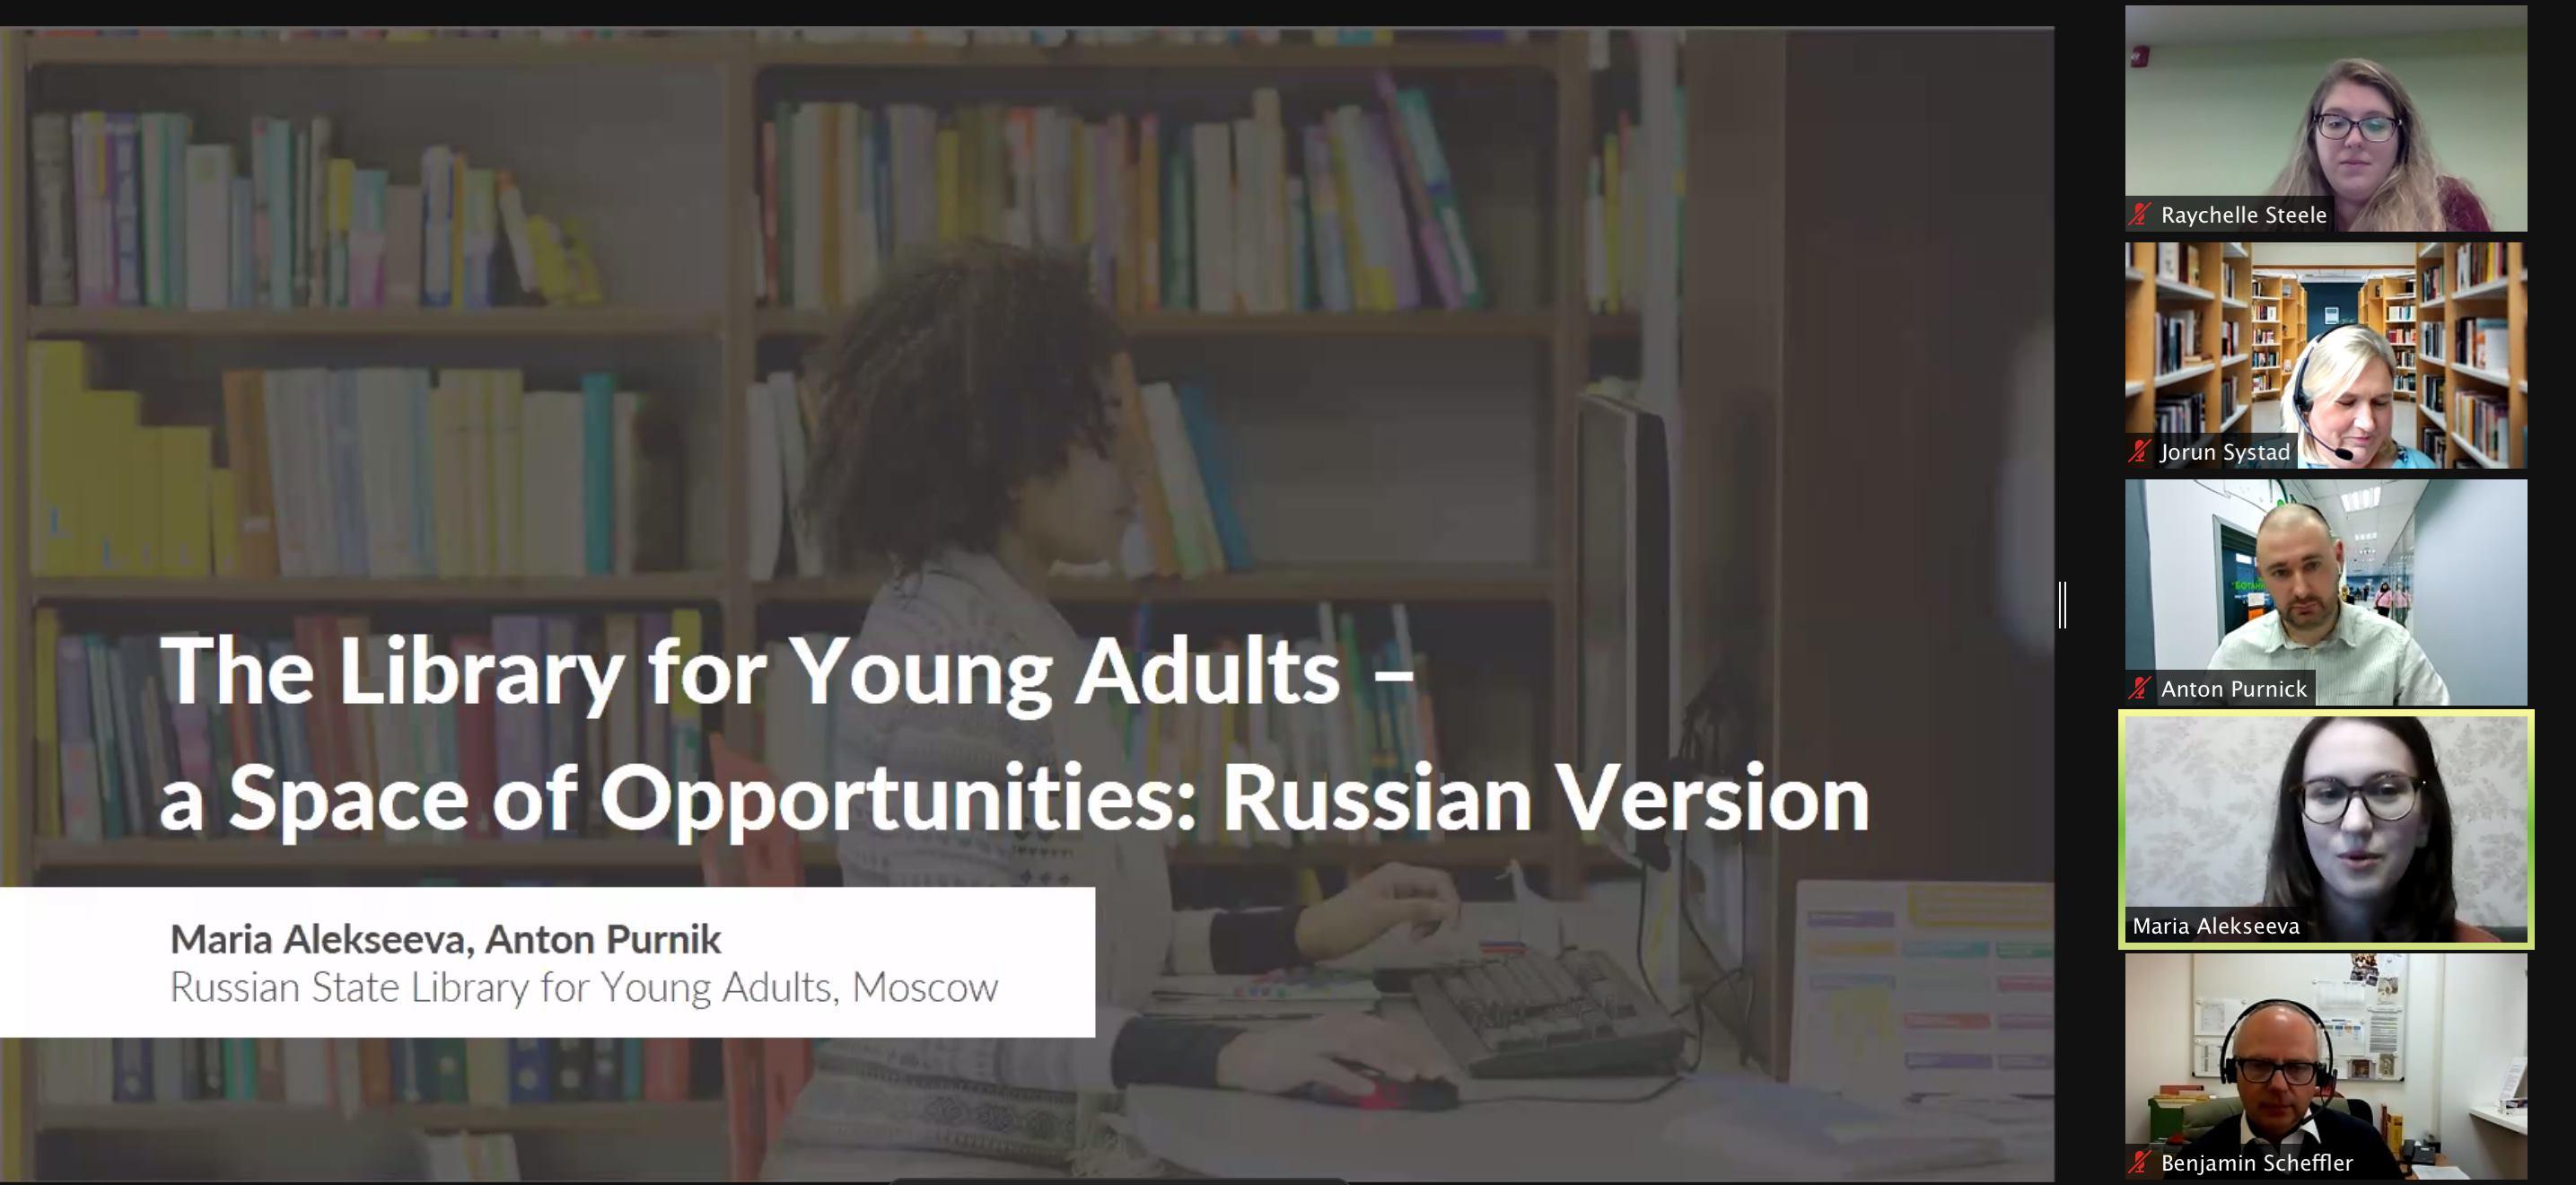 ALA Student Org's International Webinar